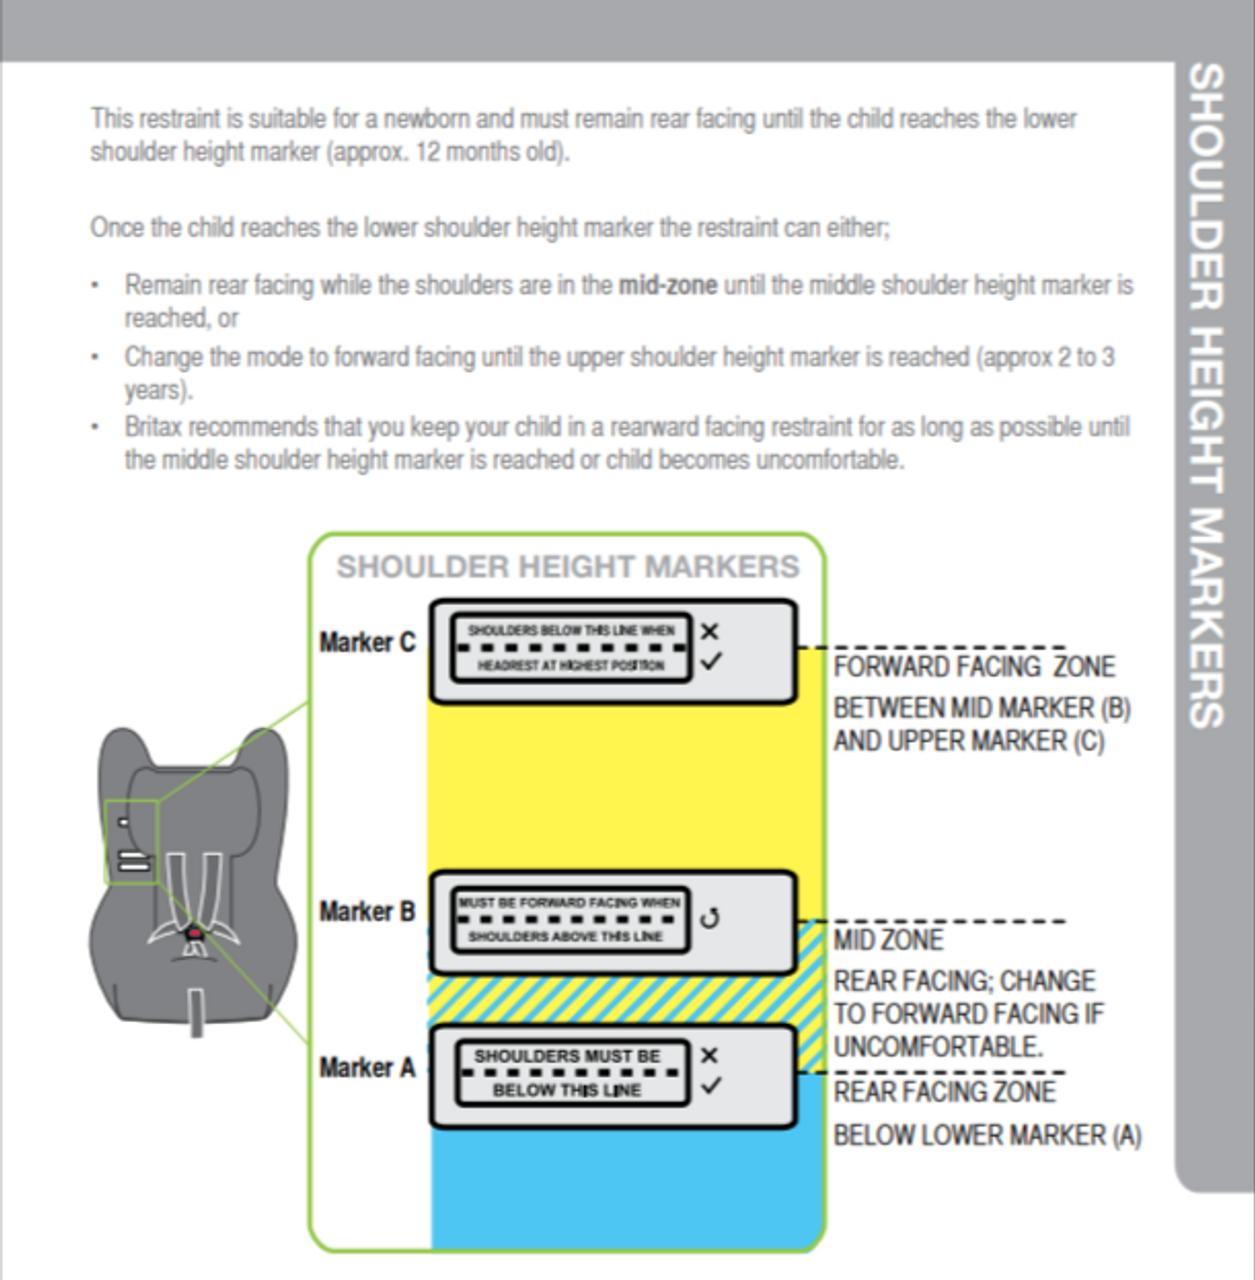 Shoulder markers guide for graphene tex